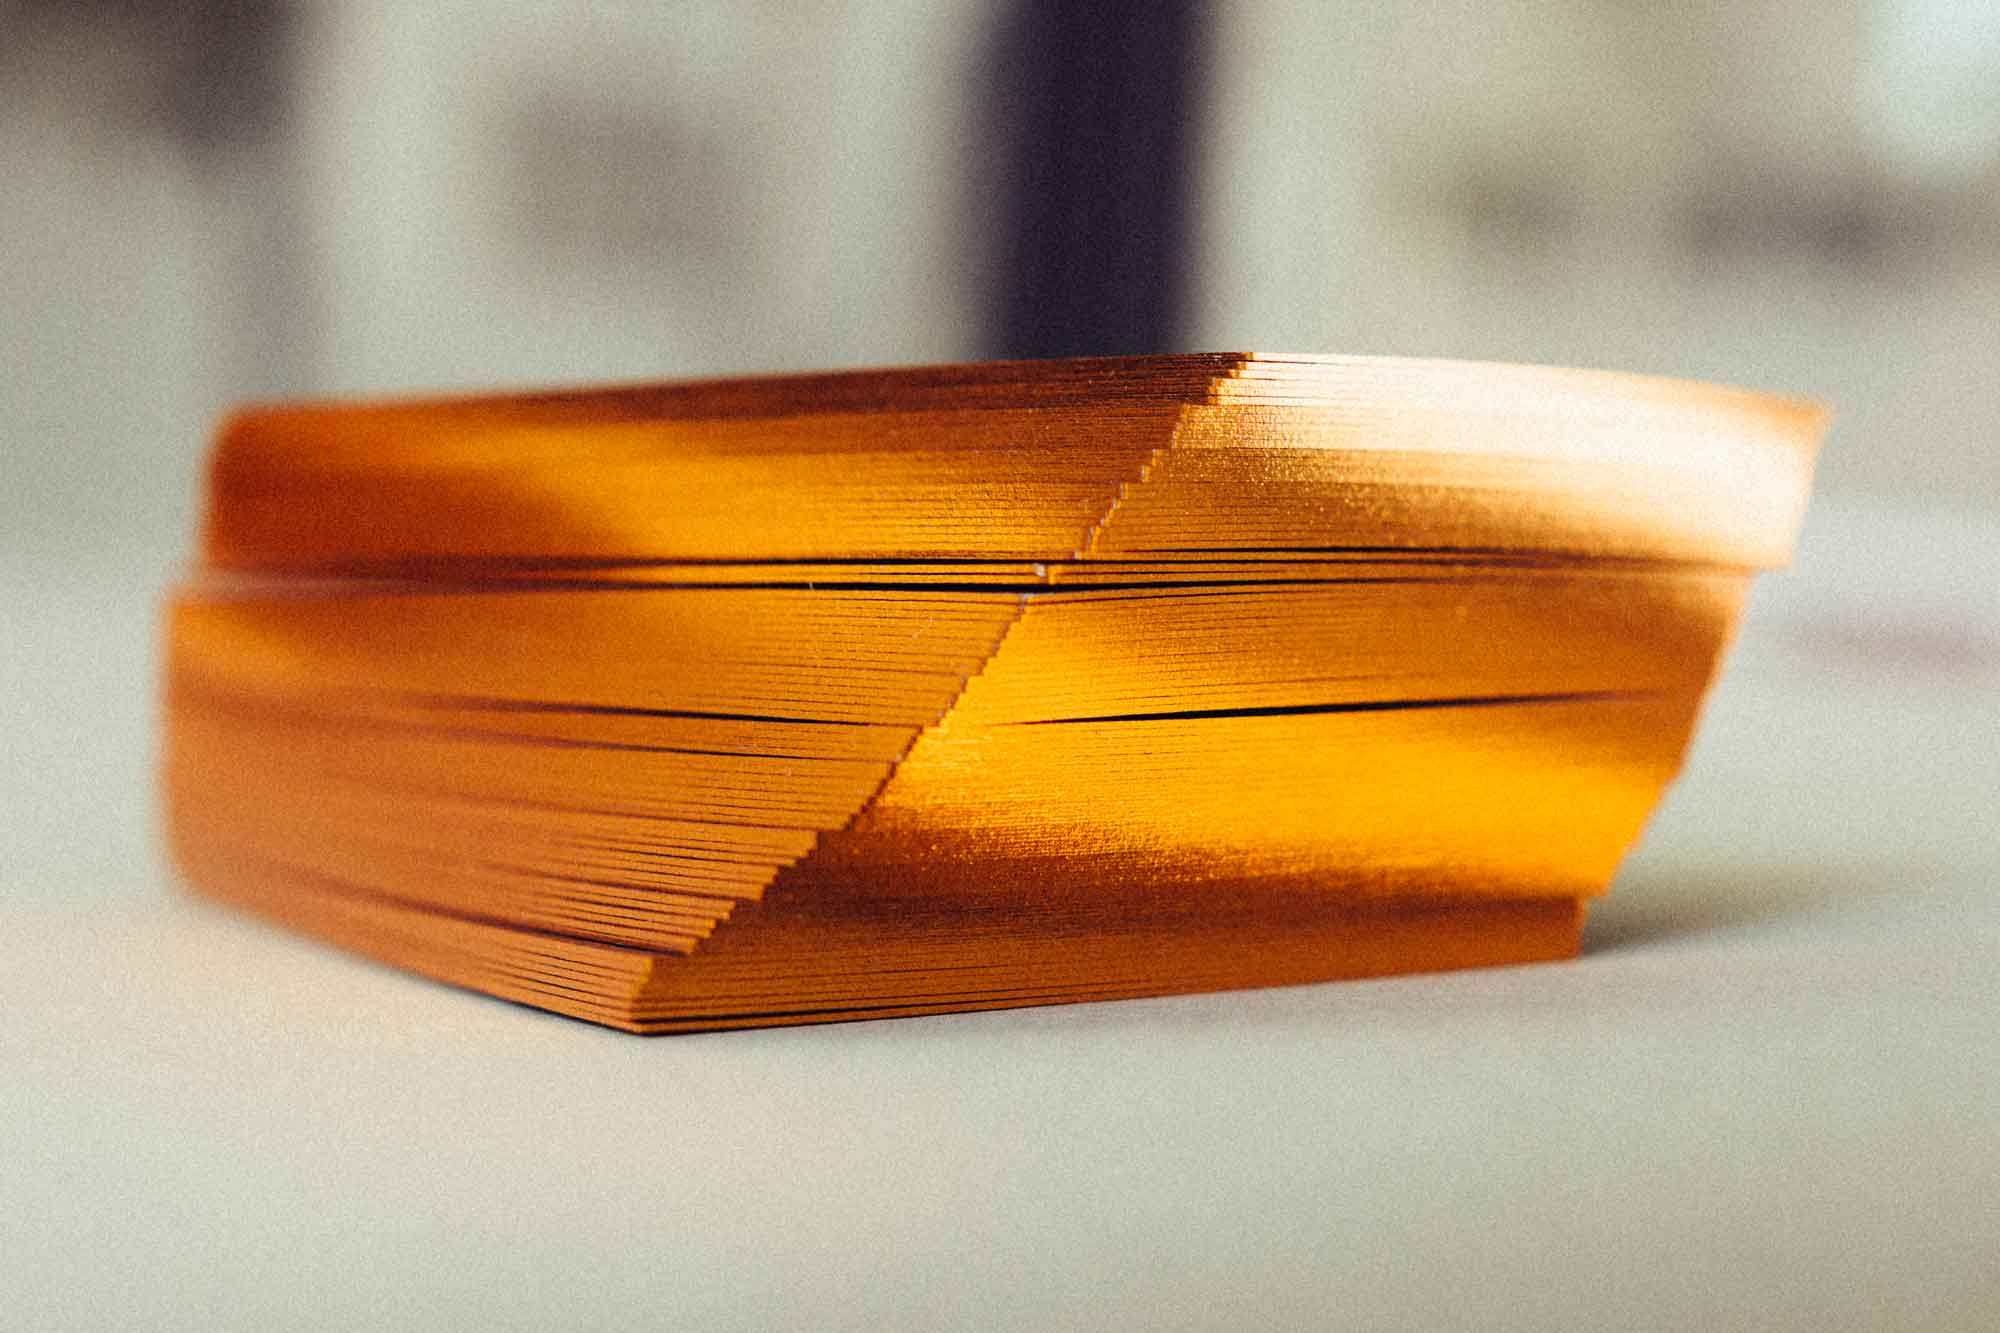 Schnittverzierung Goldschnitt Und Folienschnitt